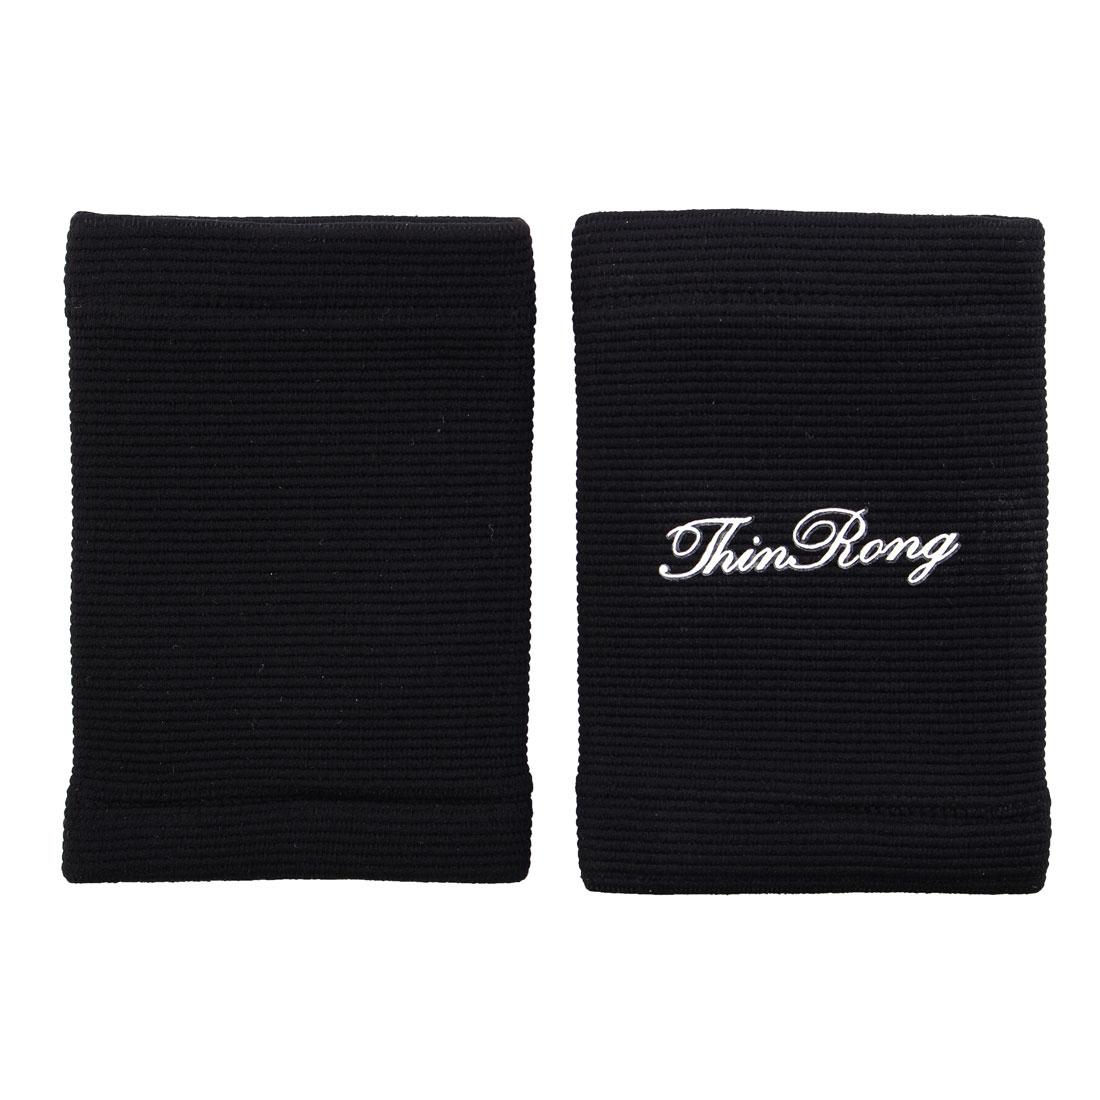 2 Pcs Black Pullover Style Elestic Wrist Sweatband Support